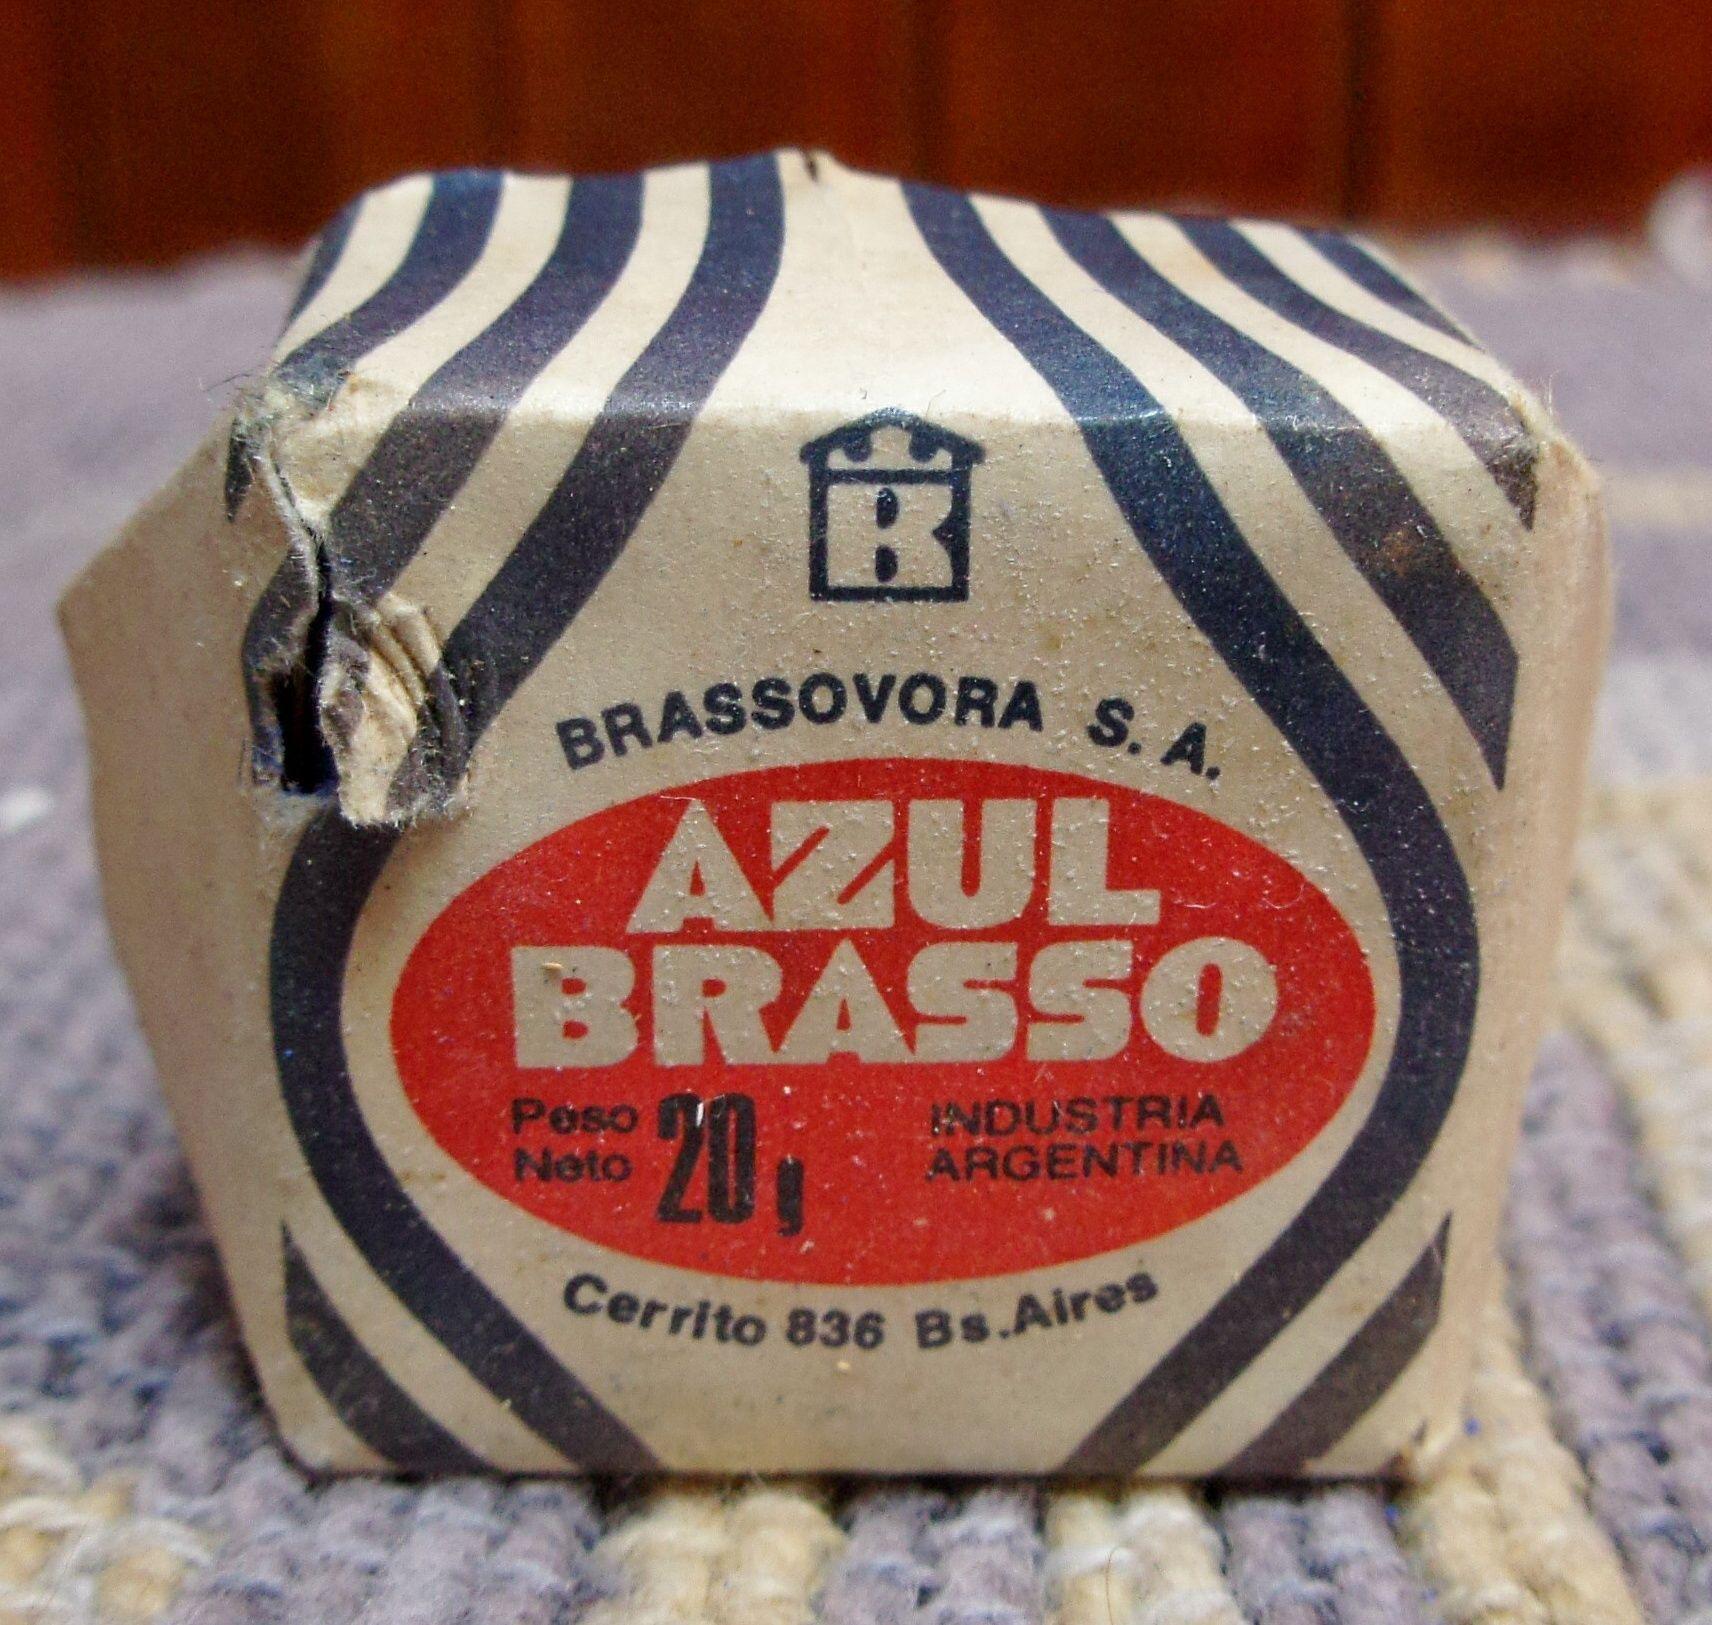 24c4ca2a9f77b PASTILLA AZUL BRASSO.....Década del 60. Esta pastilla era de color ...